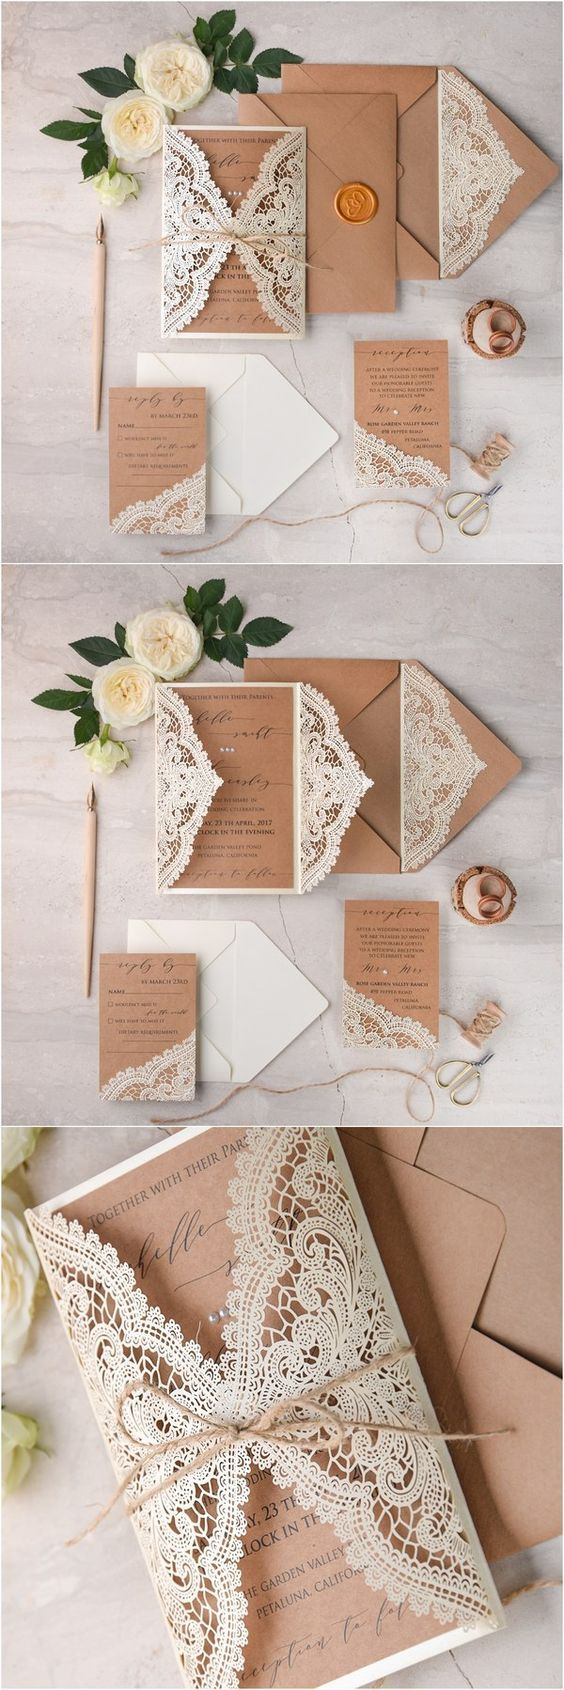 Ivory kraft paper laser cut lace rustic wedding invitations 02lCNz / http://www.deerpearlflowers.com/laser-cut-wedding-invitations/